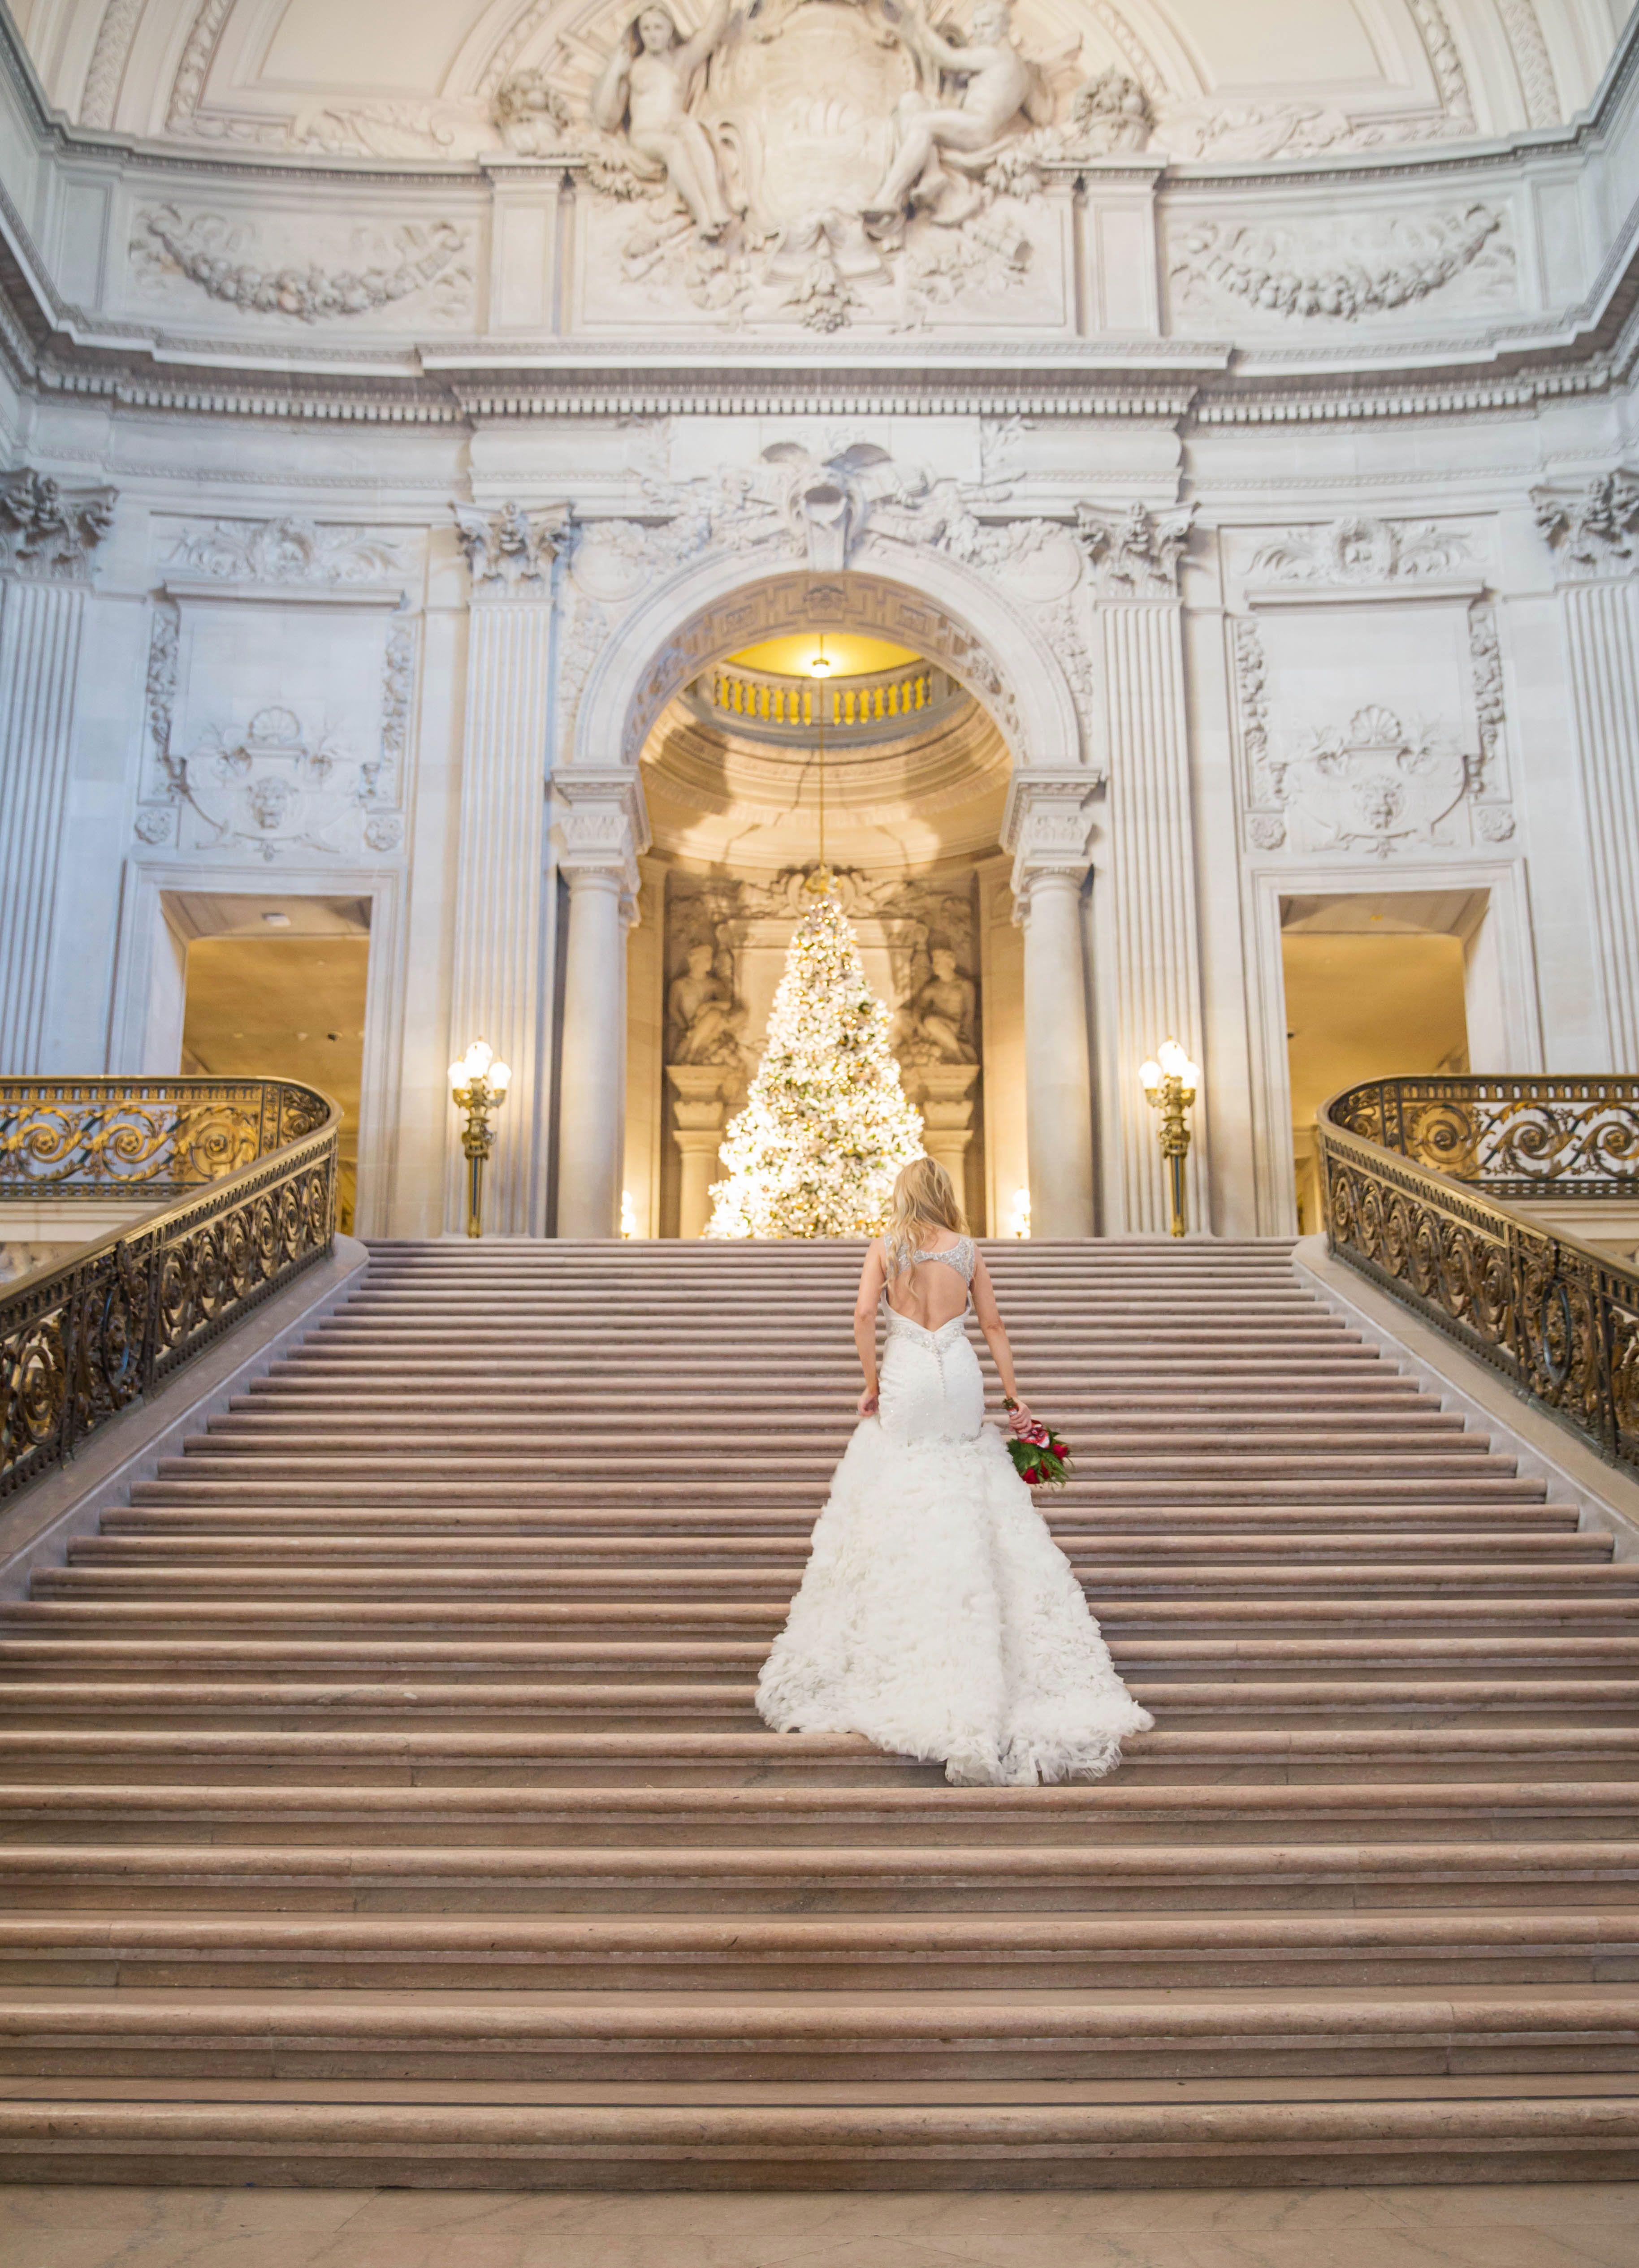 San Francisco Courthouse Wedding.Sf City Hall Wedding Ideas Wedding Wedding Photos City Buildings